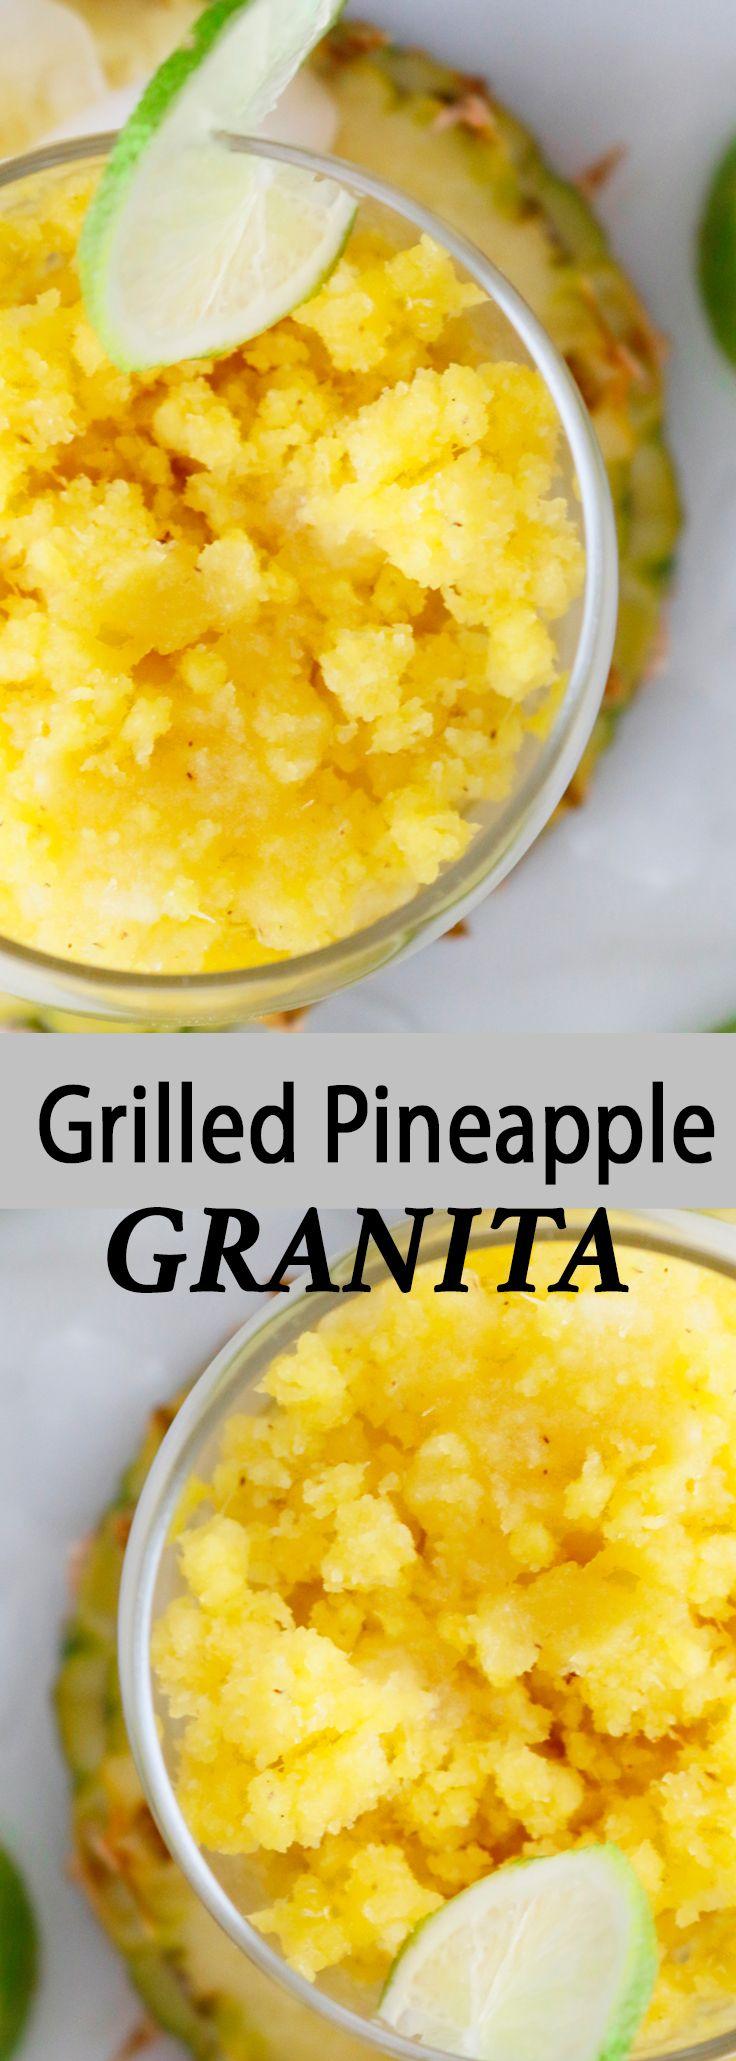 Summer desserts | popsicles | granita | pineapple granita | lime granita | easy summer desserts | grilled desserts | frozen treats | fruity desserts | pineapple